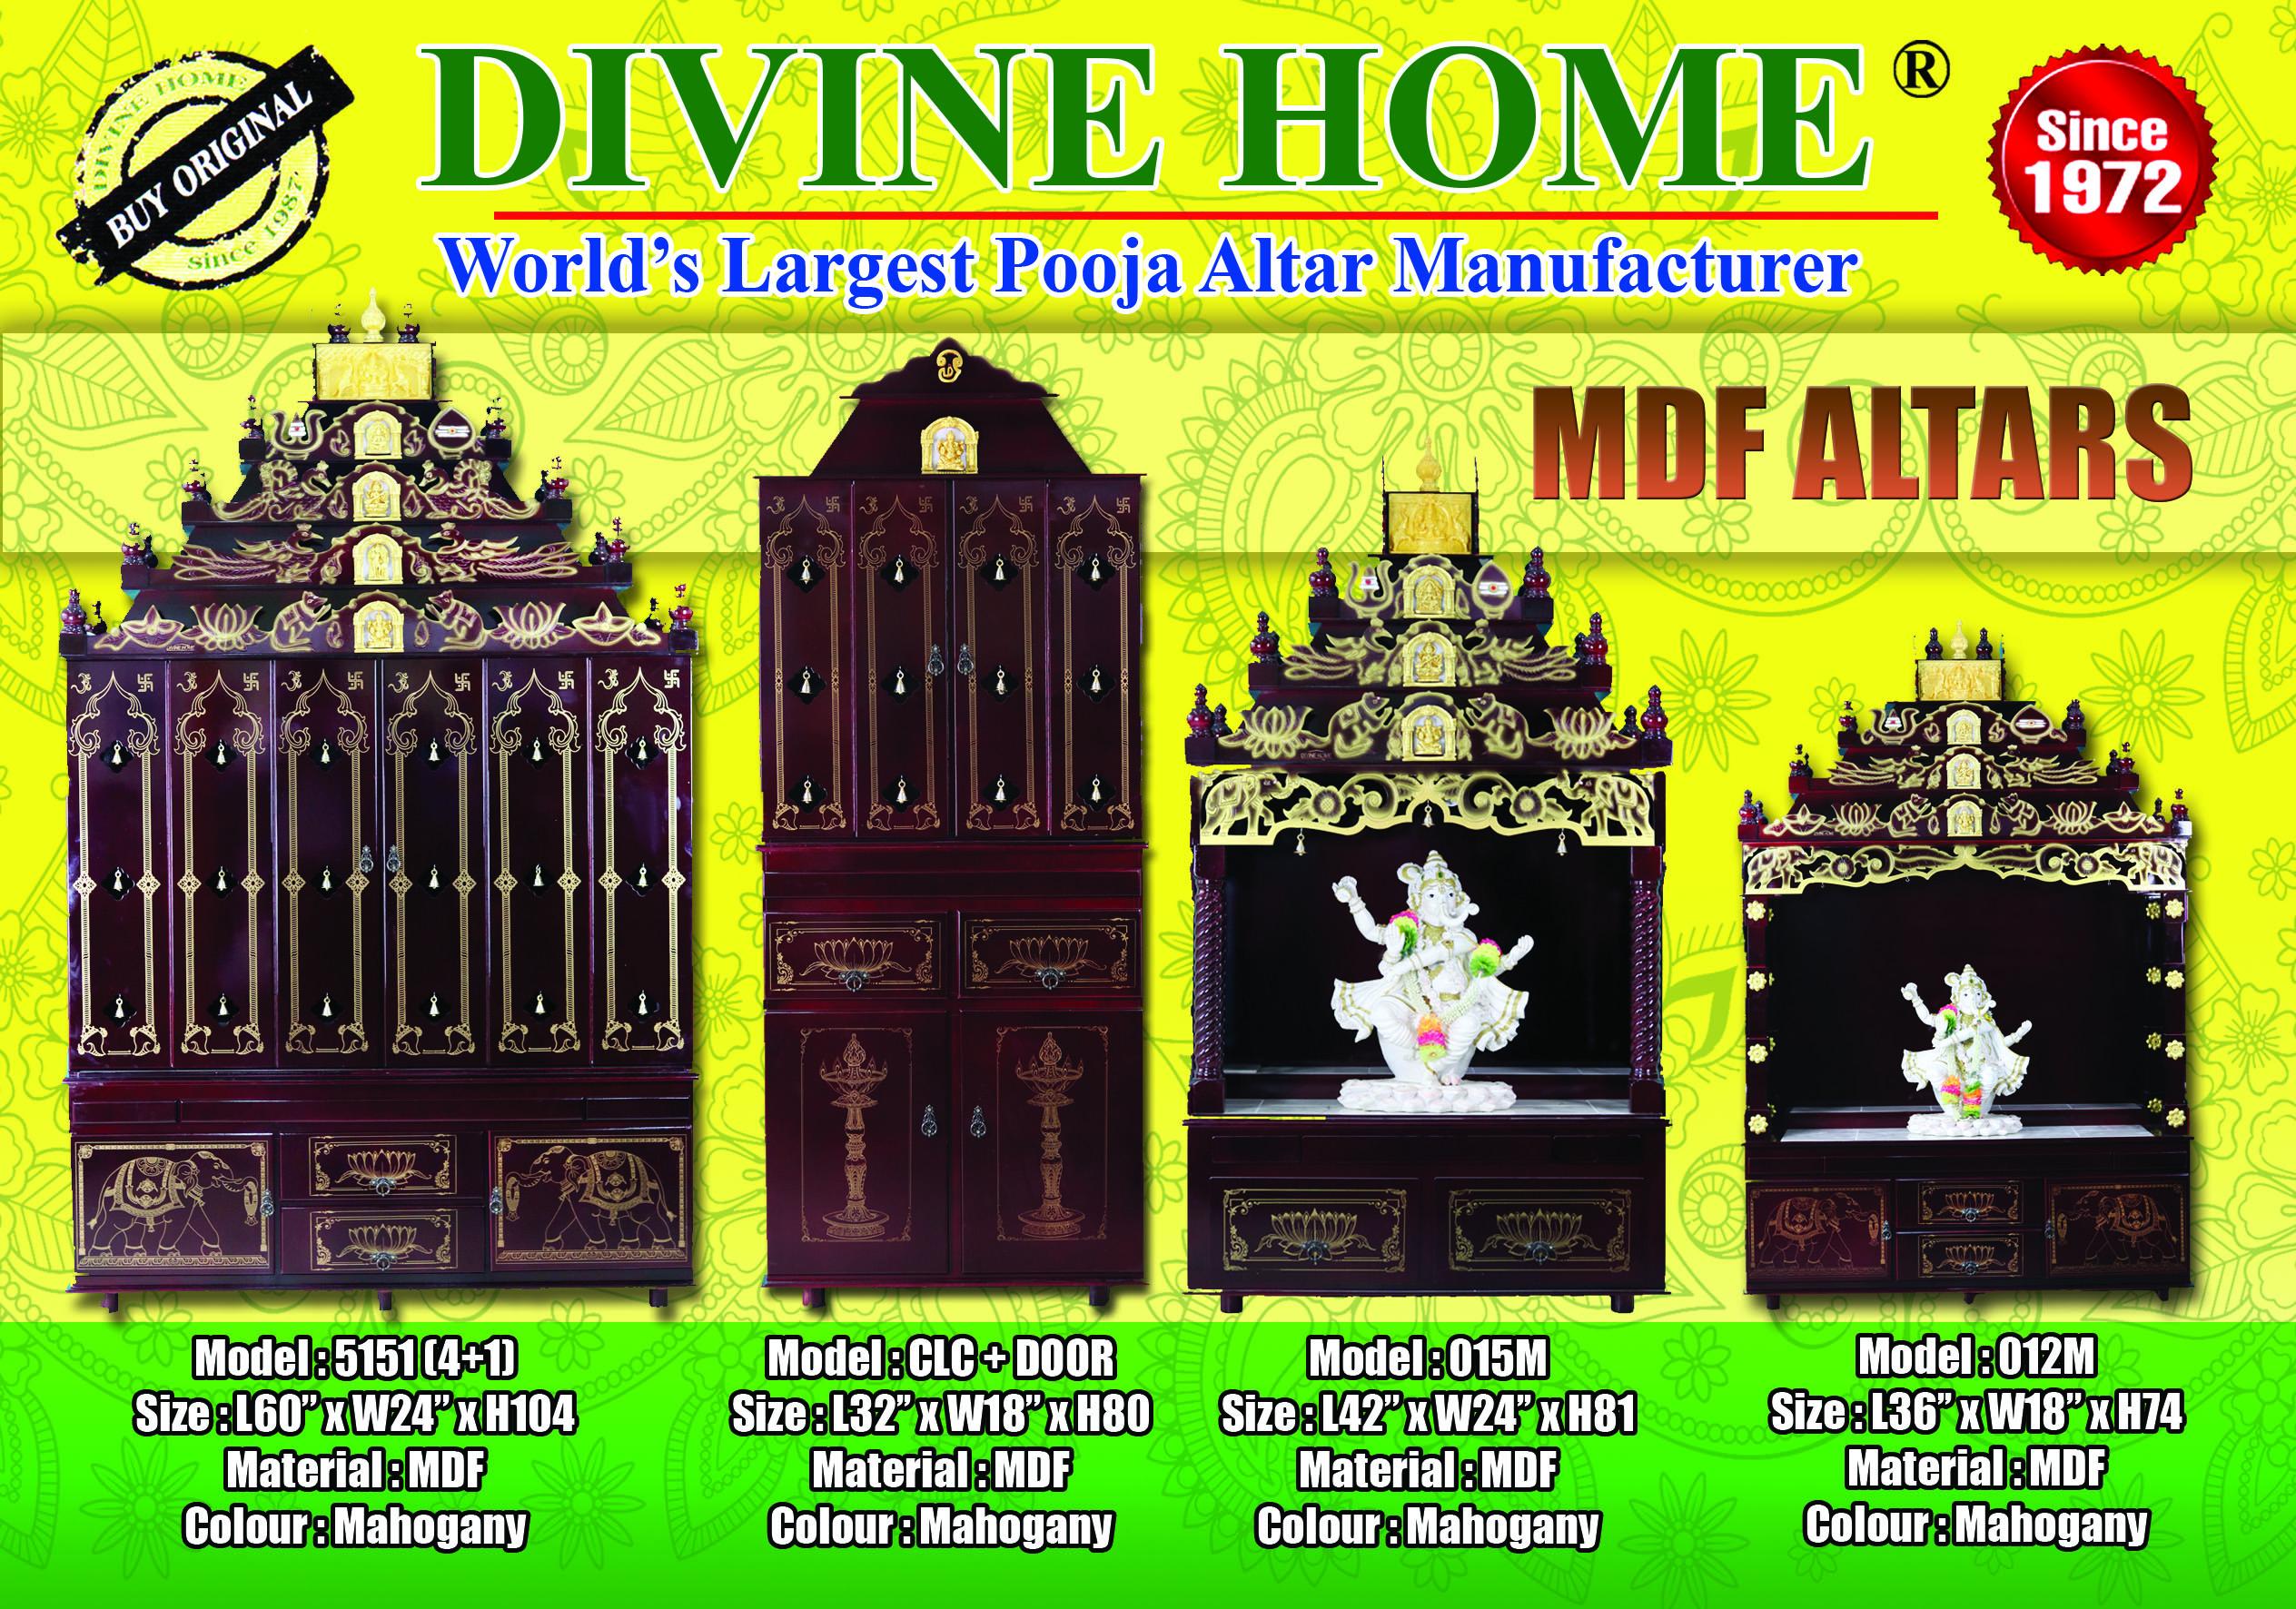 DIVINE HOME